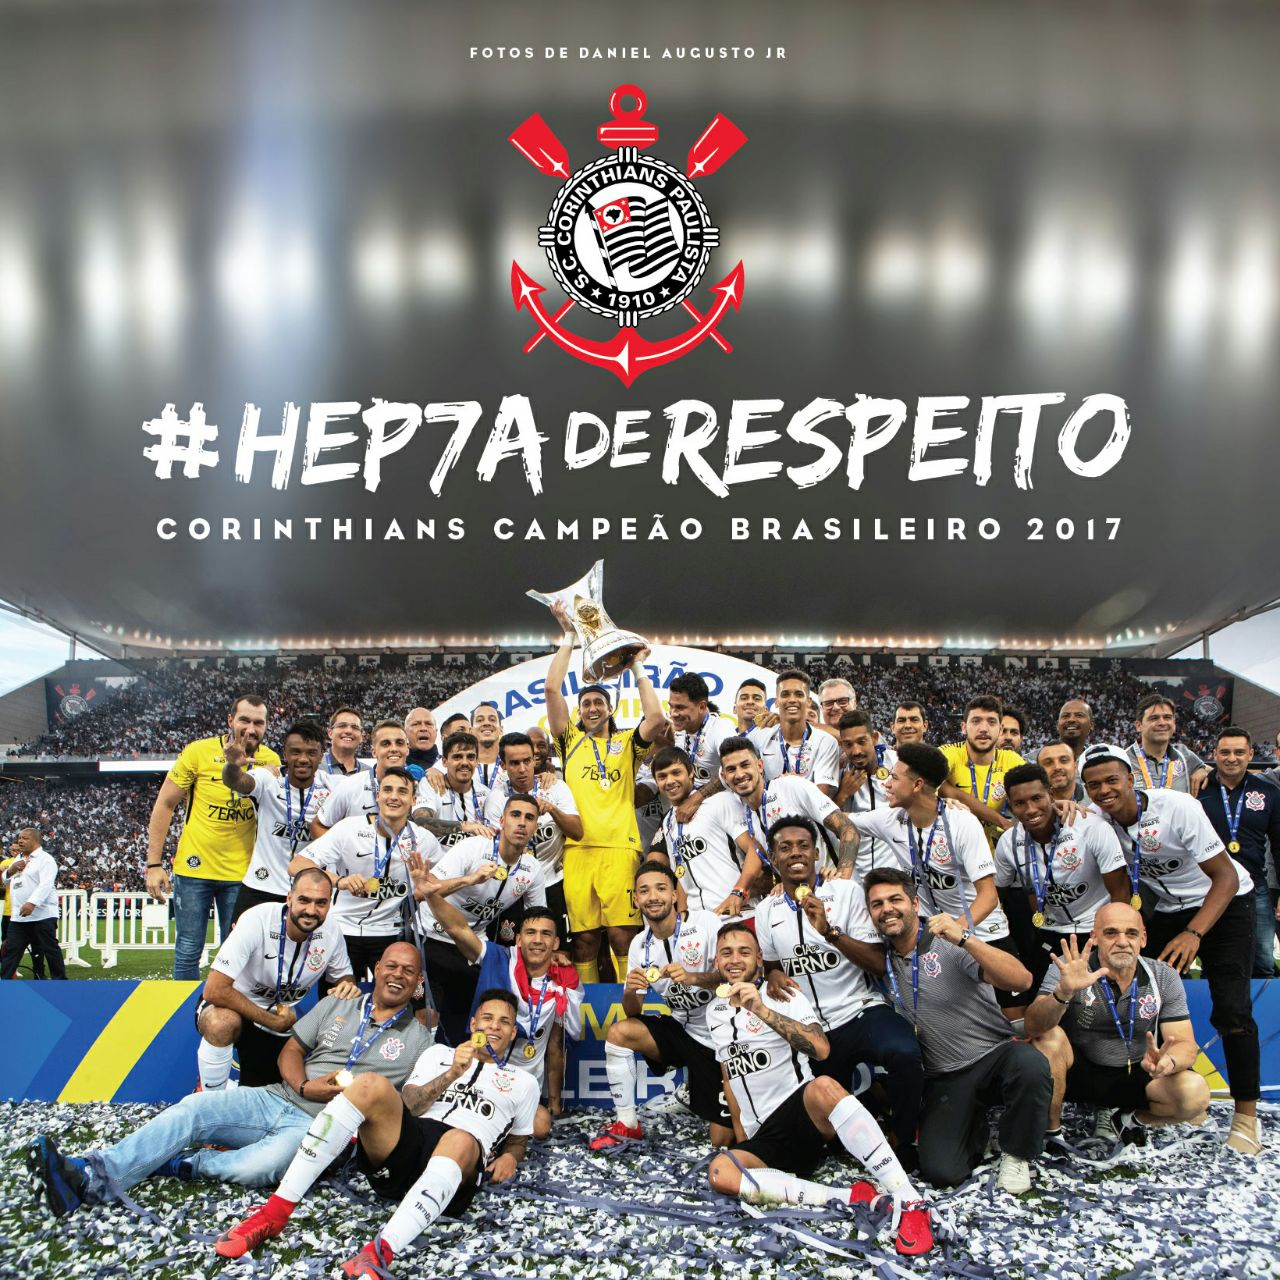 HEP7AdeRESPEITO - CORINTHIANS CAMPEÃO BRASILEIRO 2017